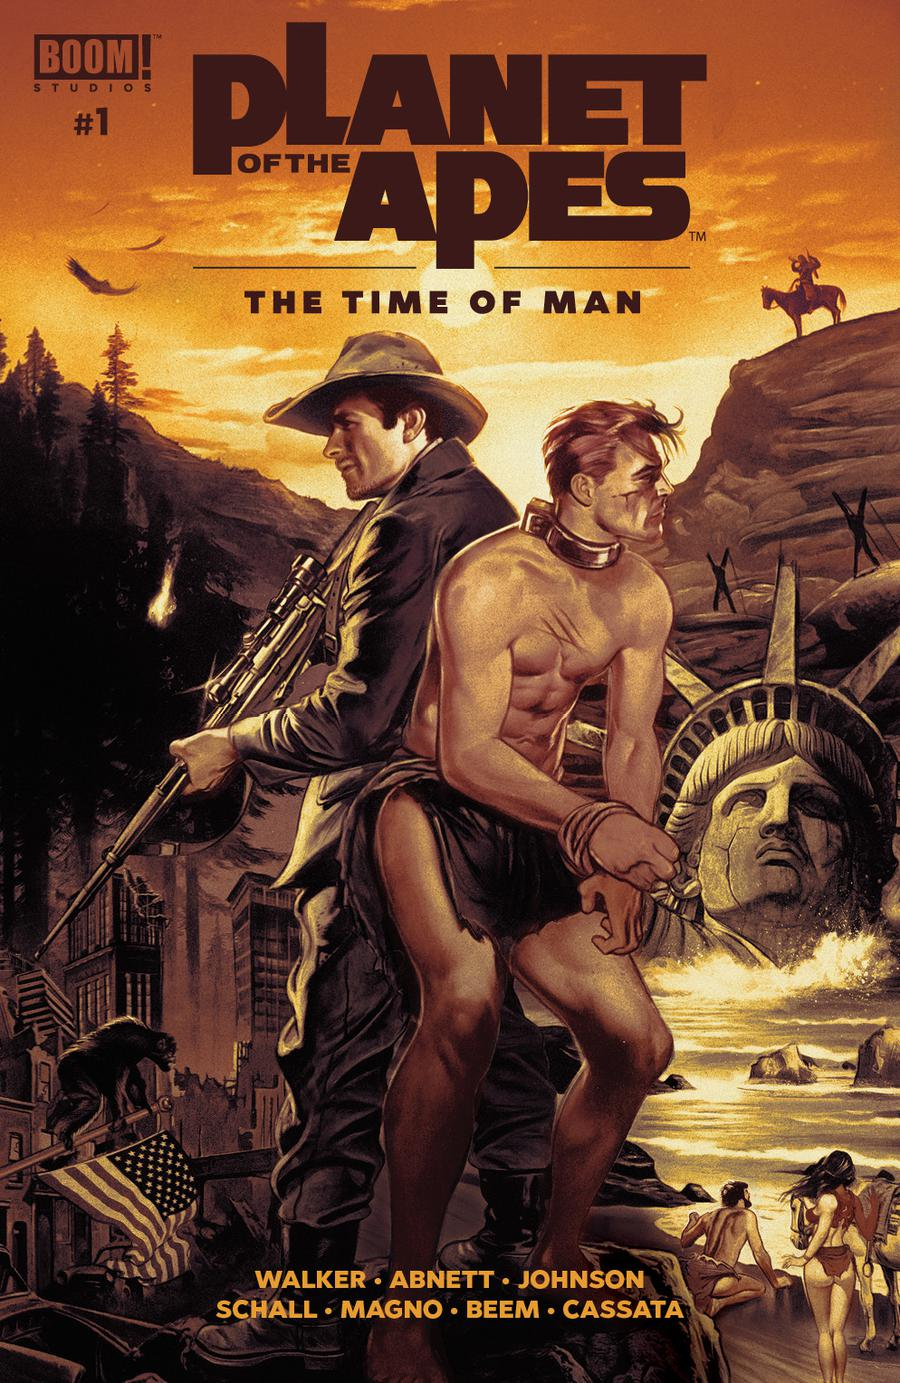 Planet Of The Apes Time Of Man #1 Cover A Regular Fay Dalton & John Keaveney Cover